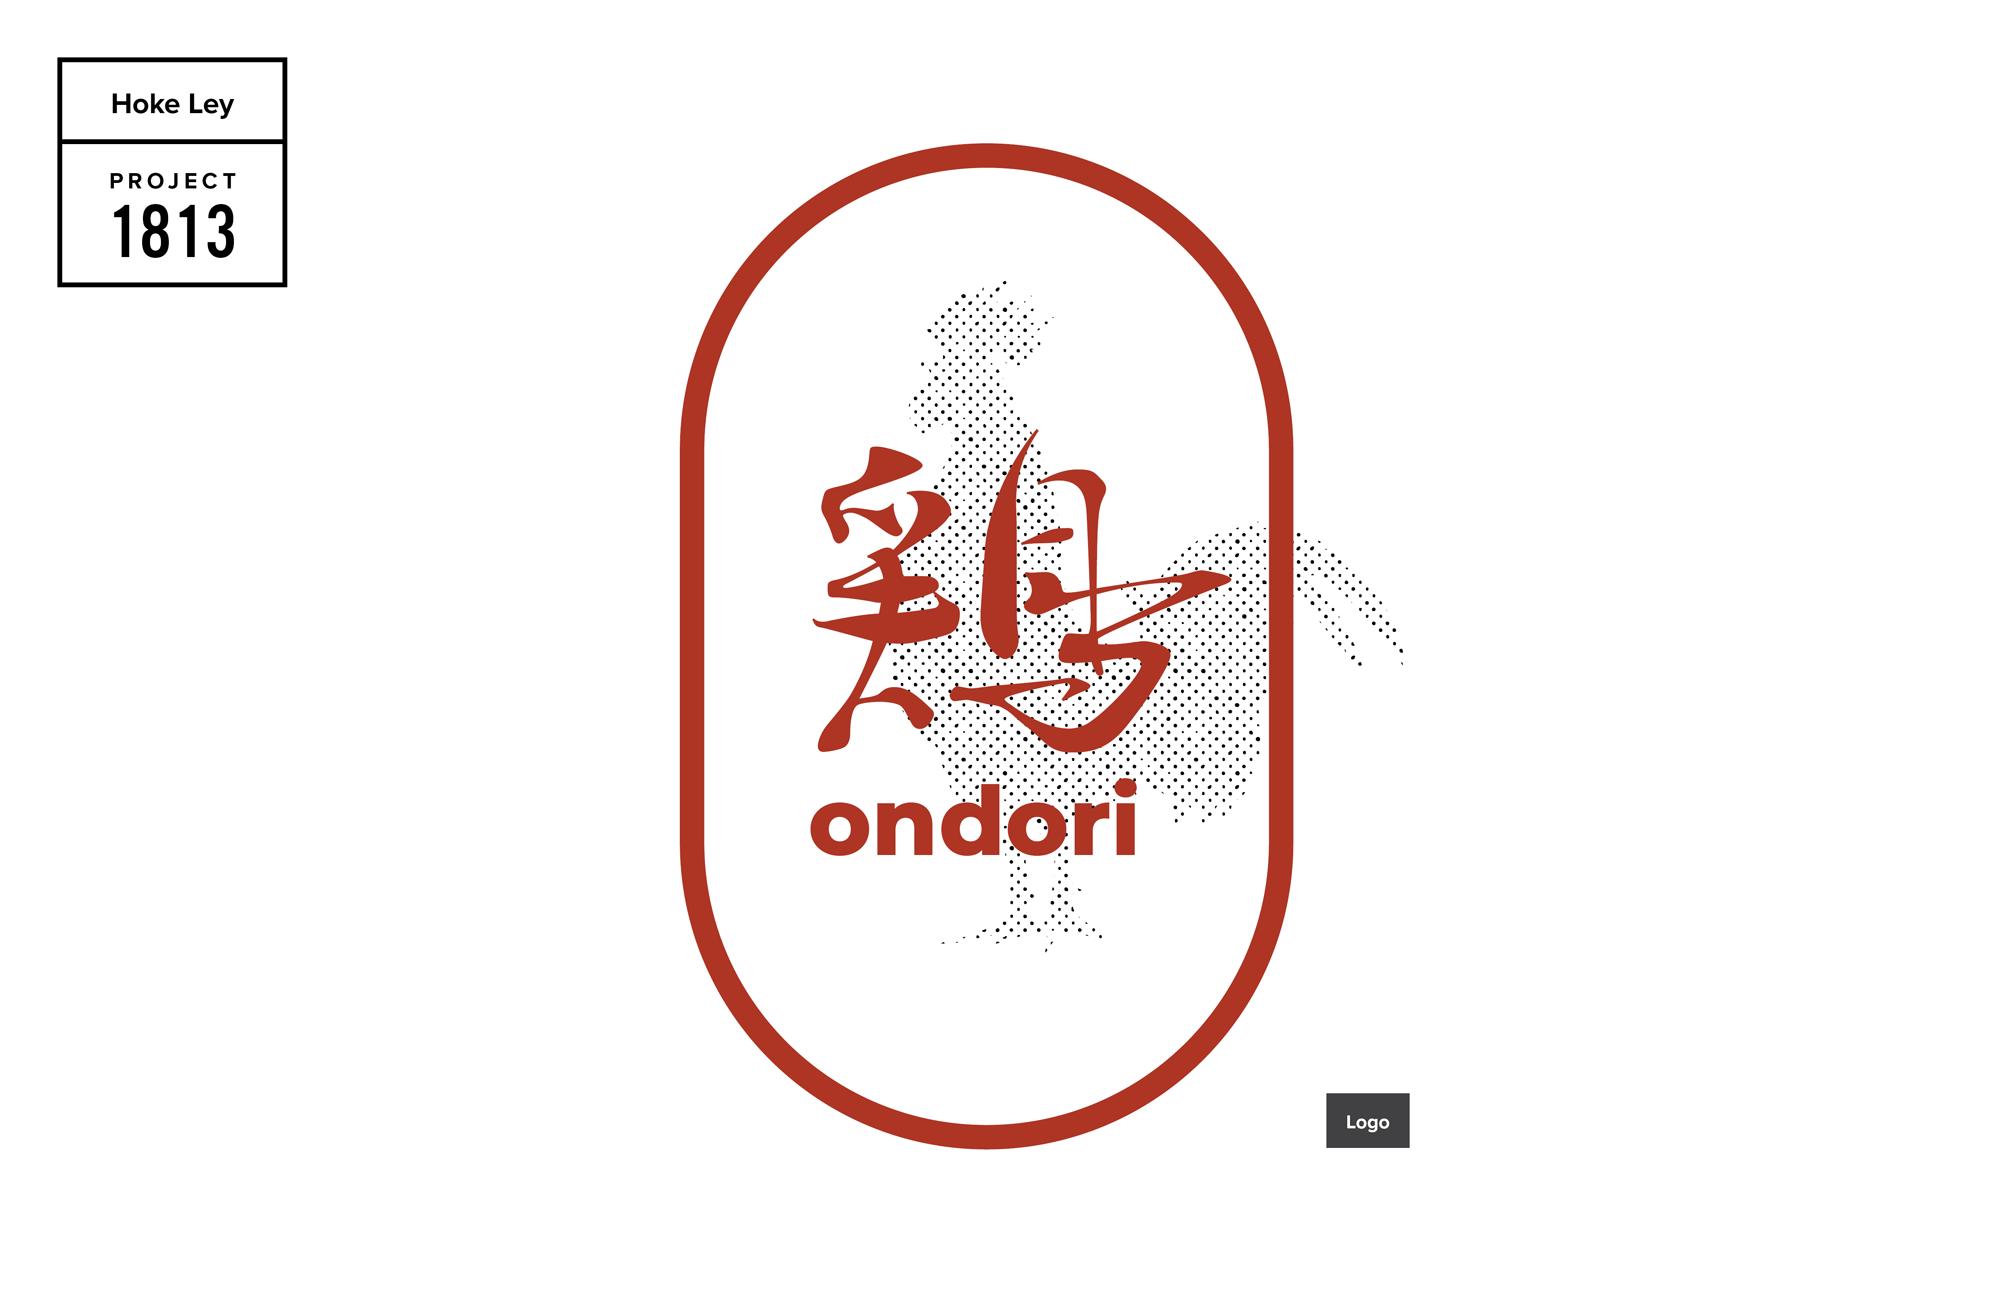 1813_ondori_graphics-signage.png